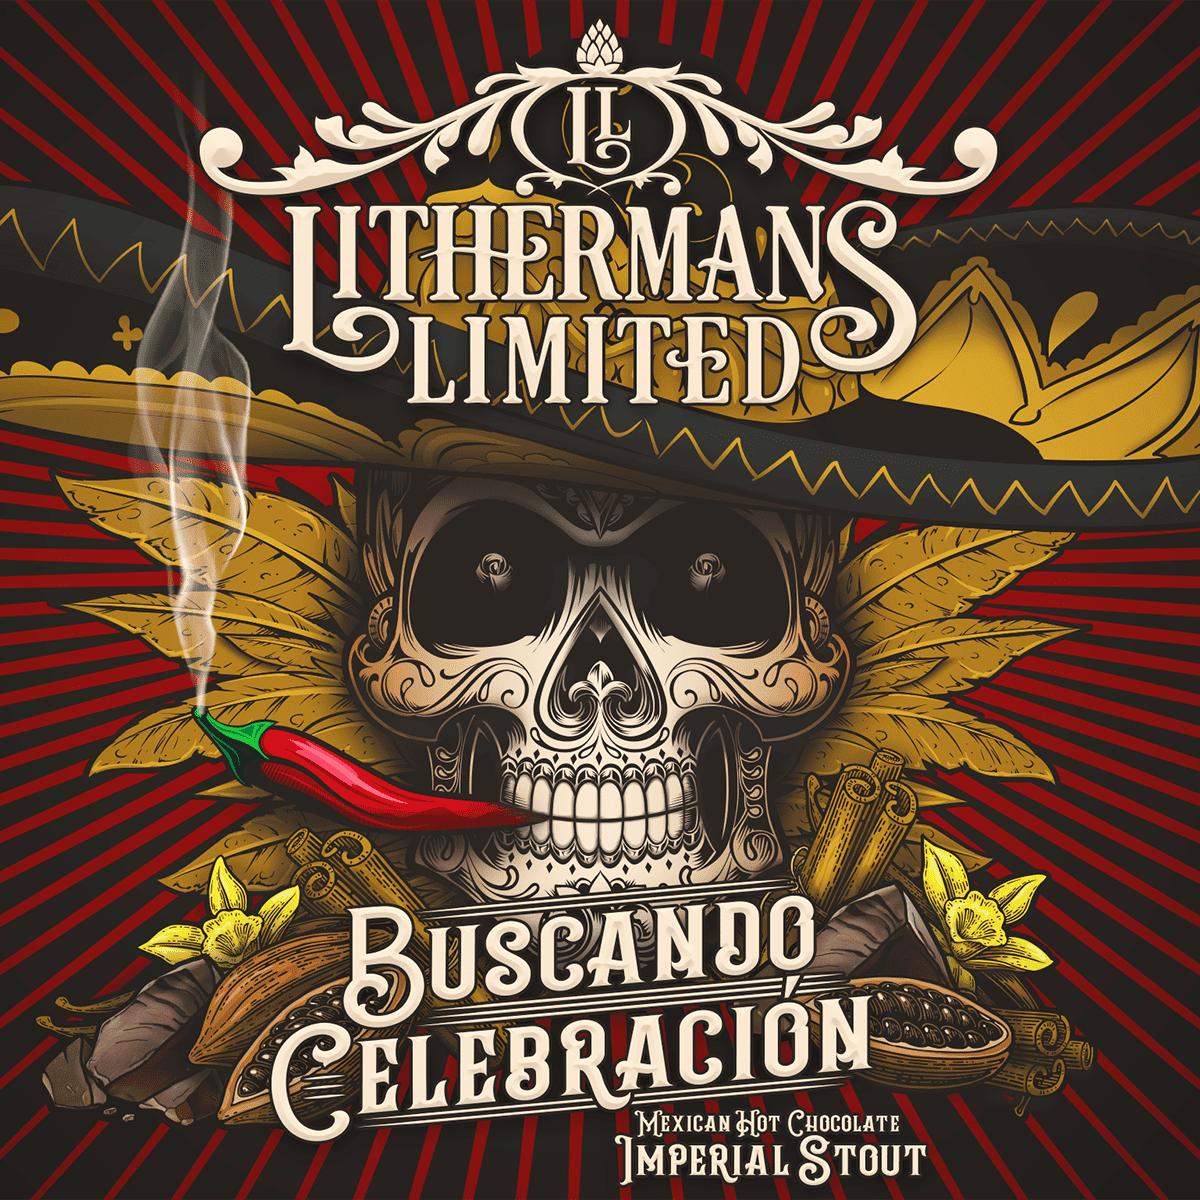 Lithermans Buscando Celebration - 12oz